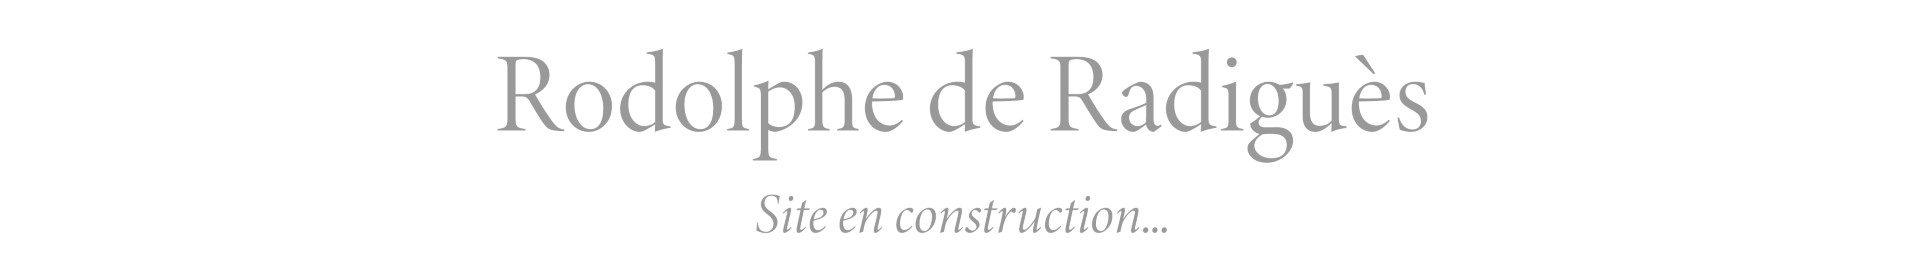 Rodolphe de Radiguès